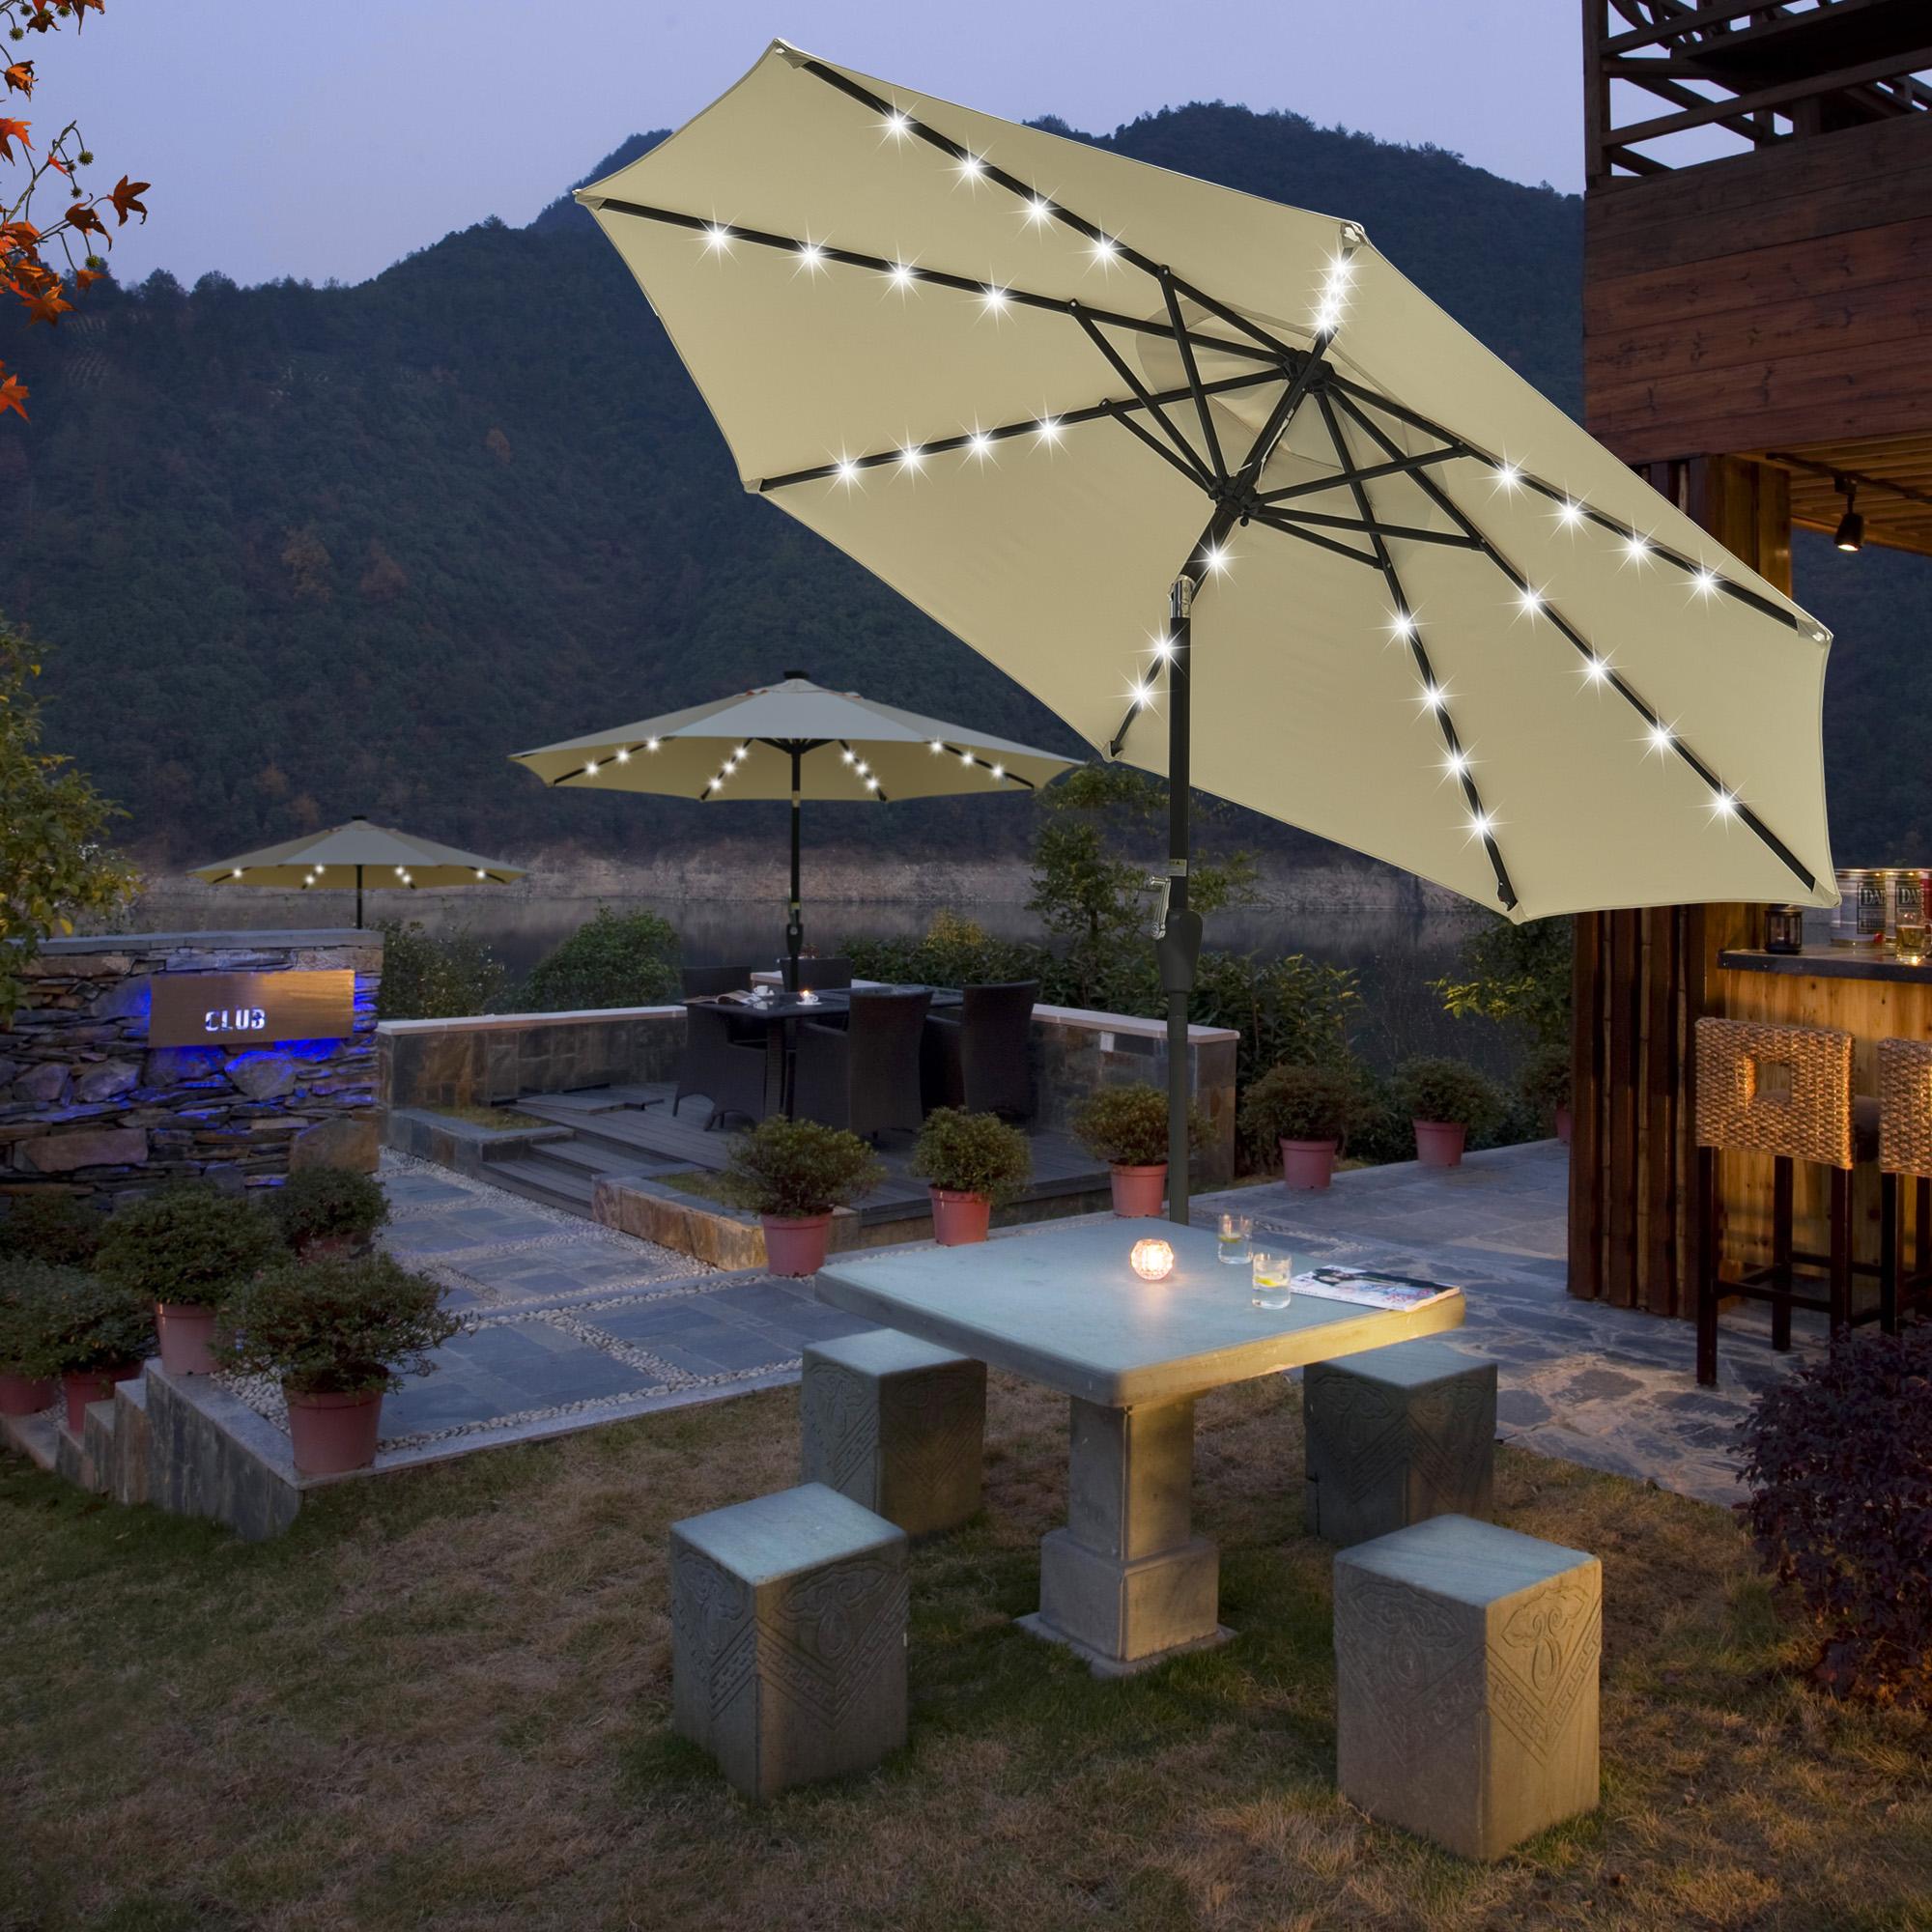 thumbnail 27 - 9' Patio Outdoor Umbrella Solar LED 8 Rib Garden Parasol Yard Deck Table Shade